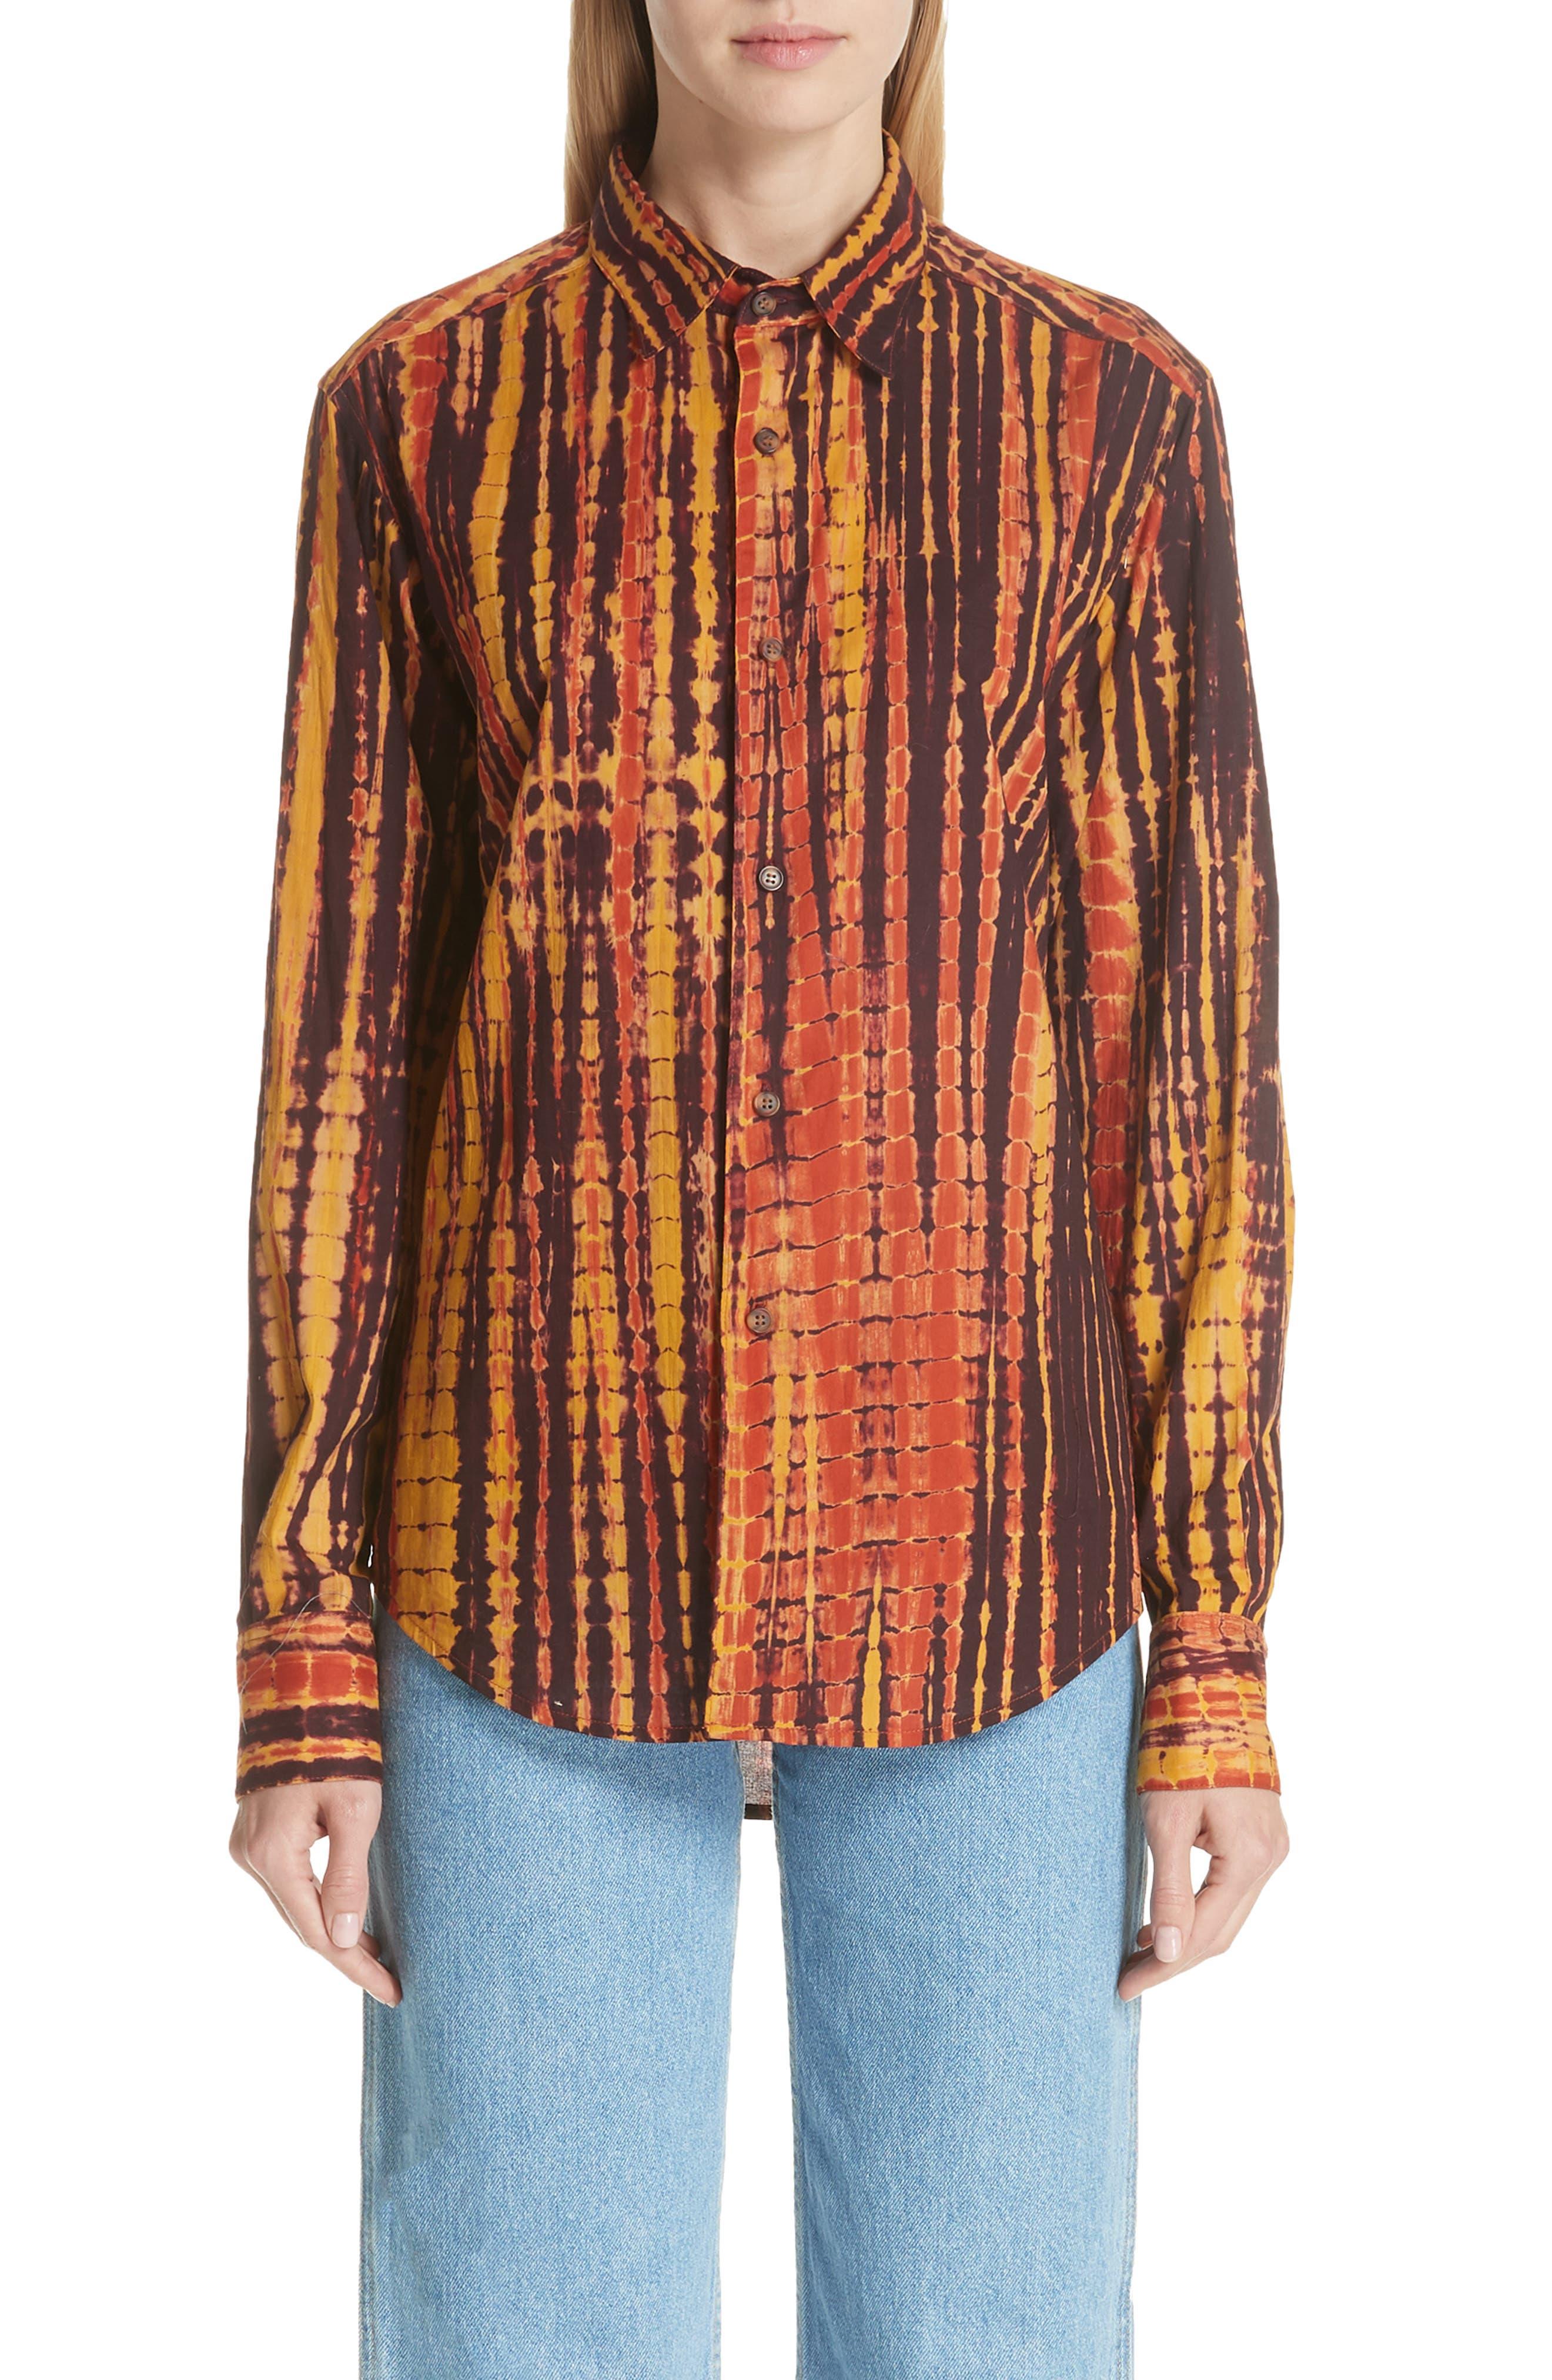 ECKHAUS LATTA,                             Hand Dyed Cotton Shirt,                             Main thumbnail 1, color,                             200